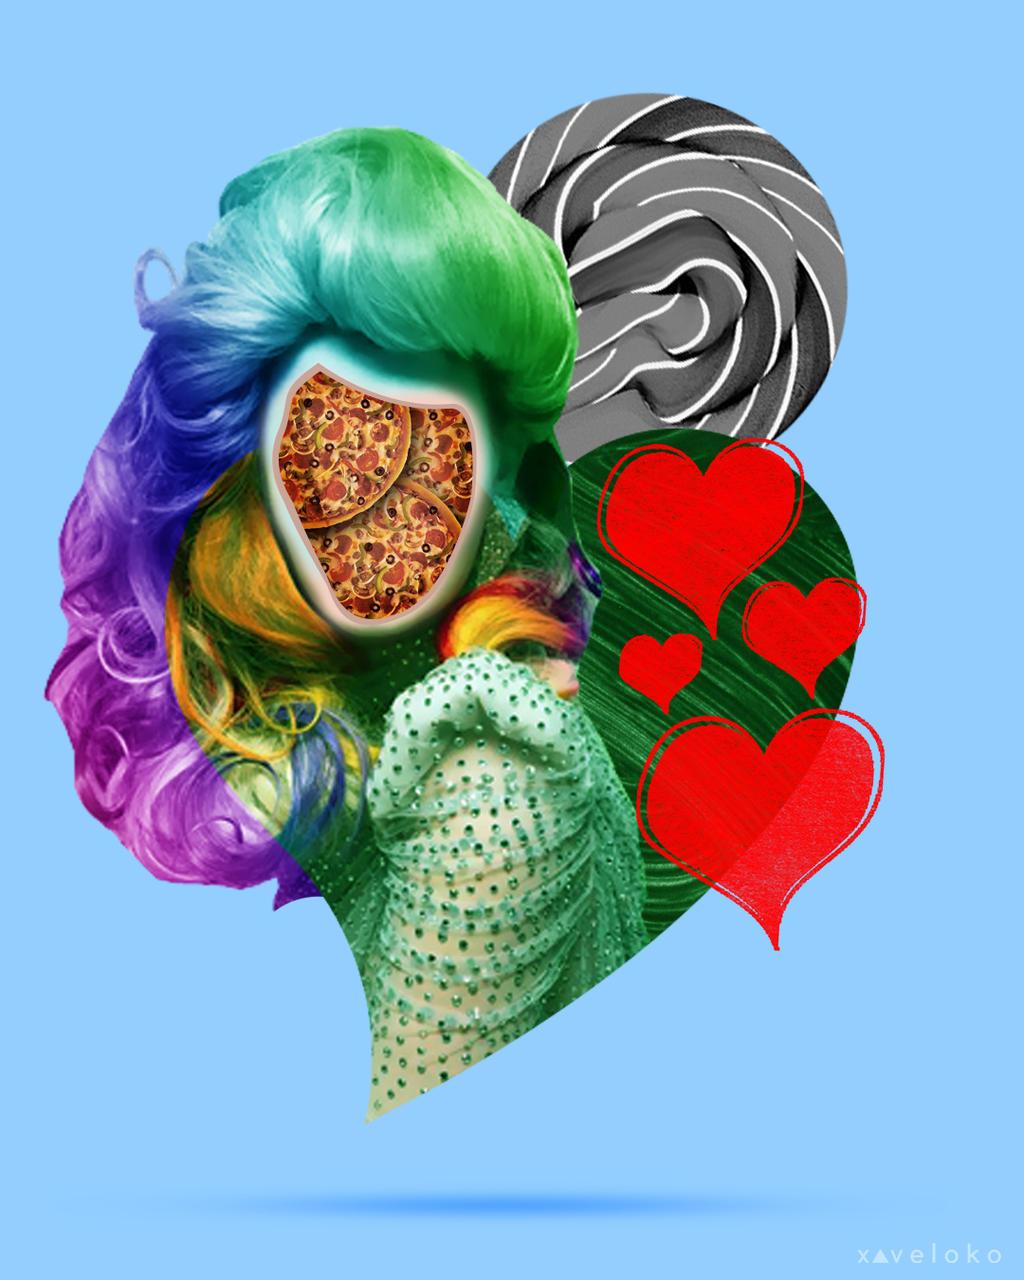 Pizza Face by xavierlokollo